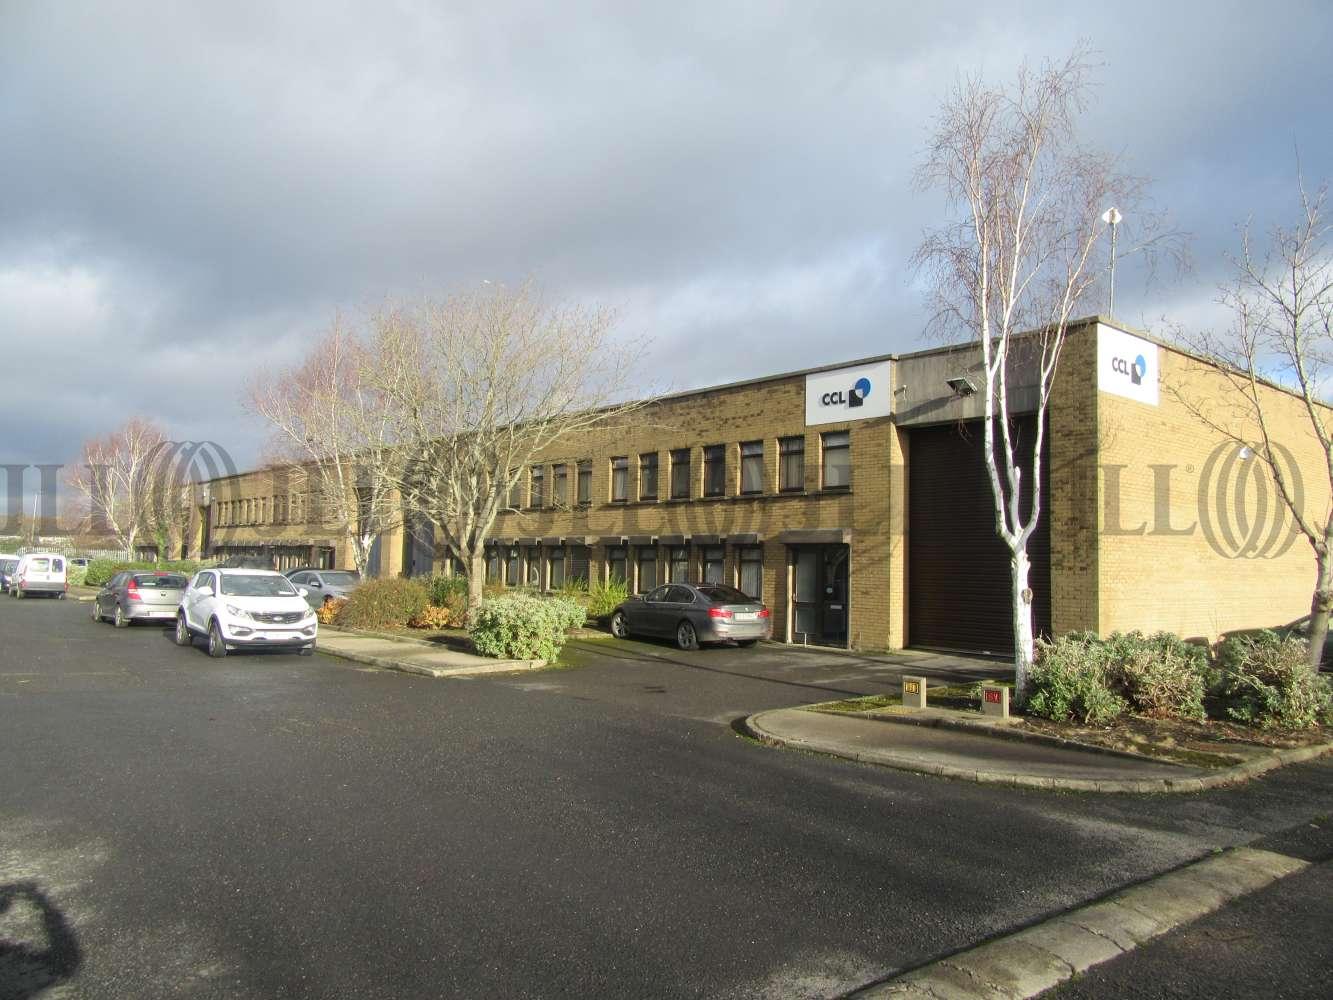 Industrial Dublin 24,  - Unit 74 Broomhill Road, Tallaght Industrial Estate